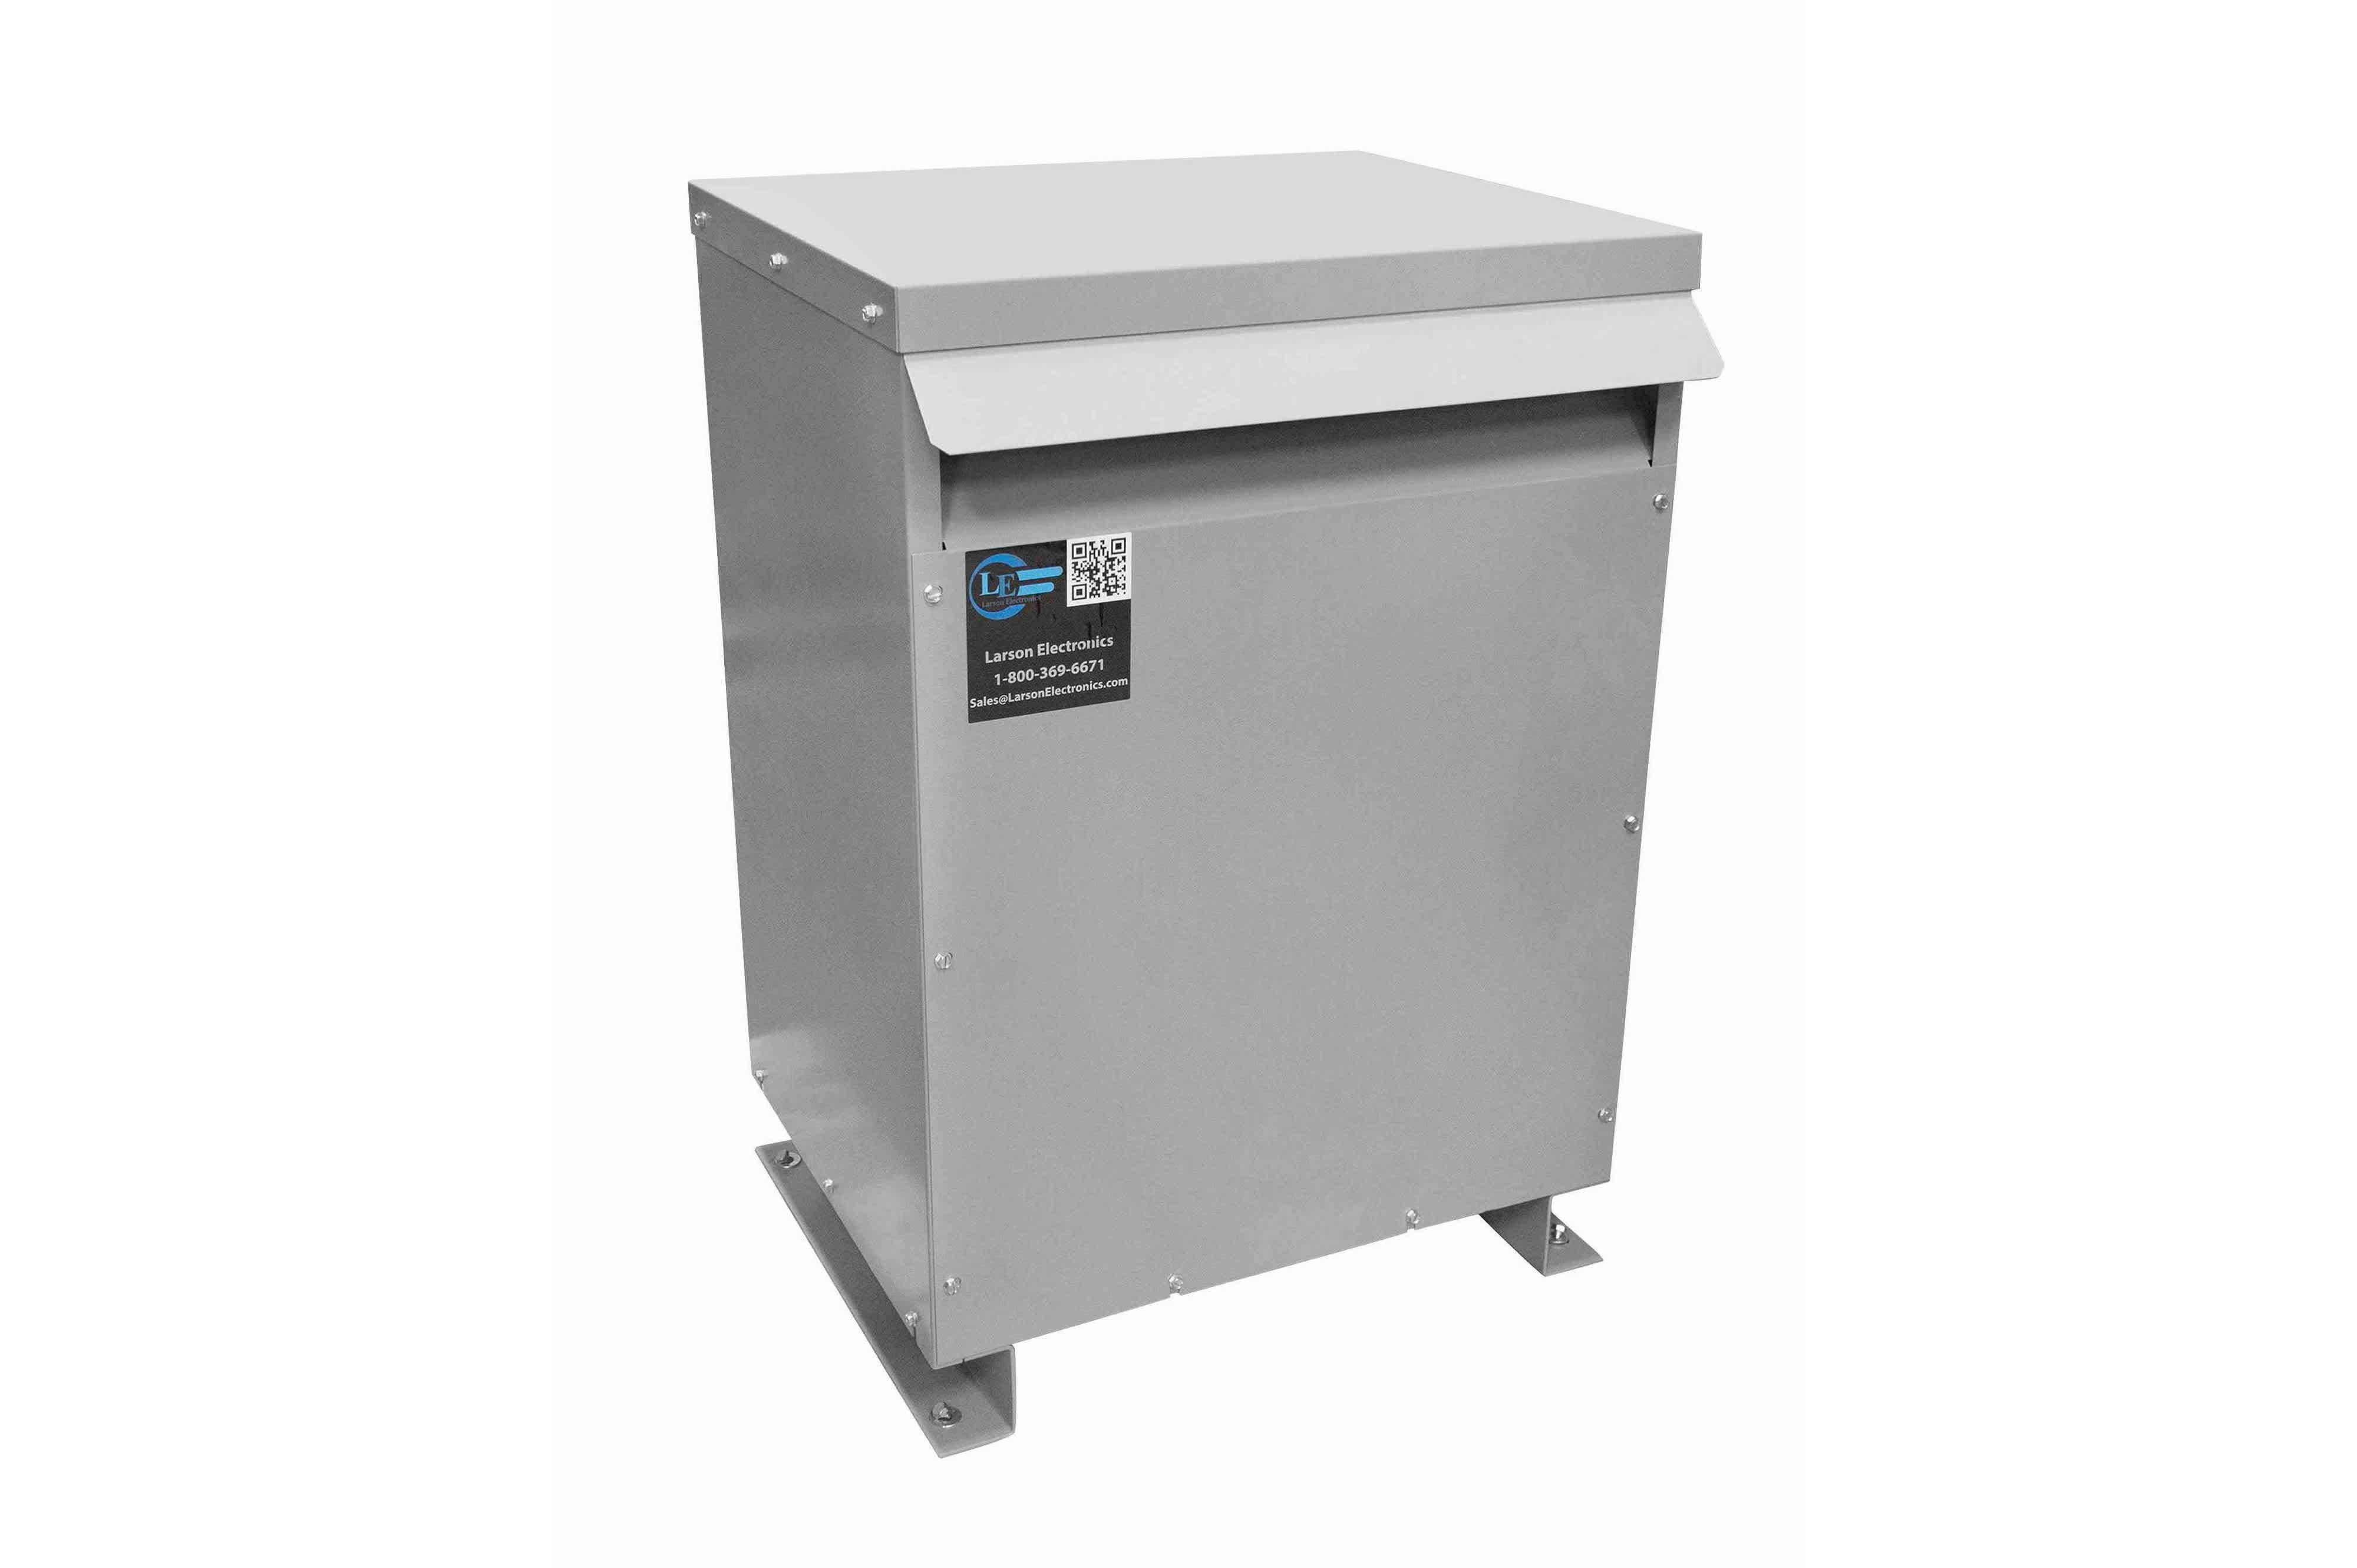 500 kVA 3PH Isolation Transformer, 230V Wye Primary, 480Y/277 Wye-N Secondary, N3R, Ventilated, 60 Hz